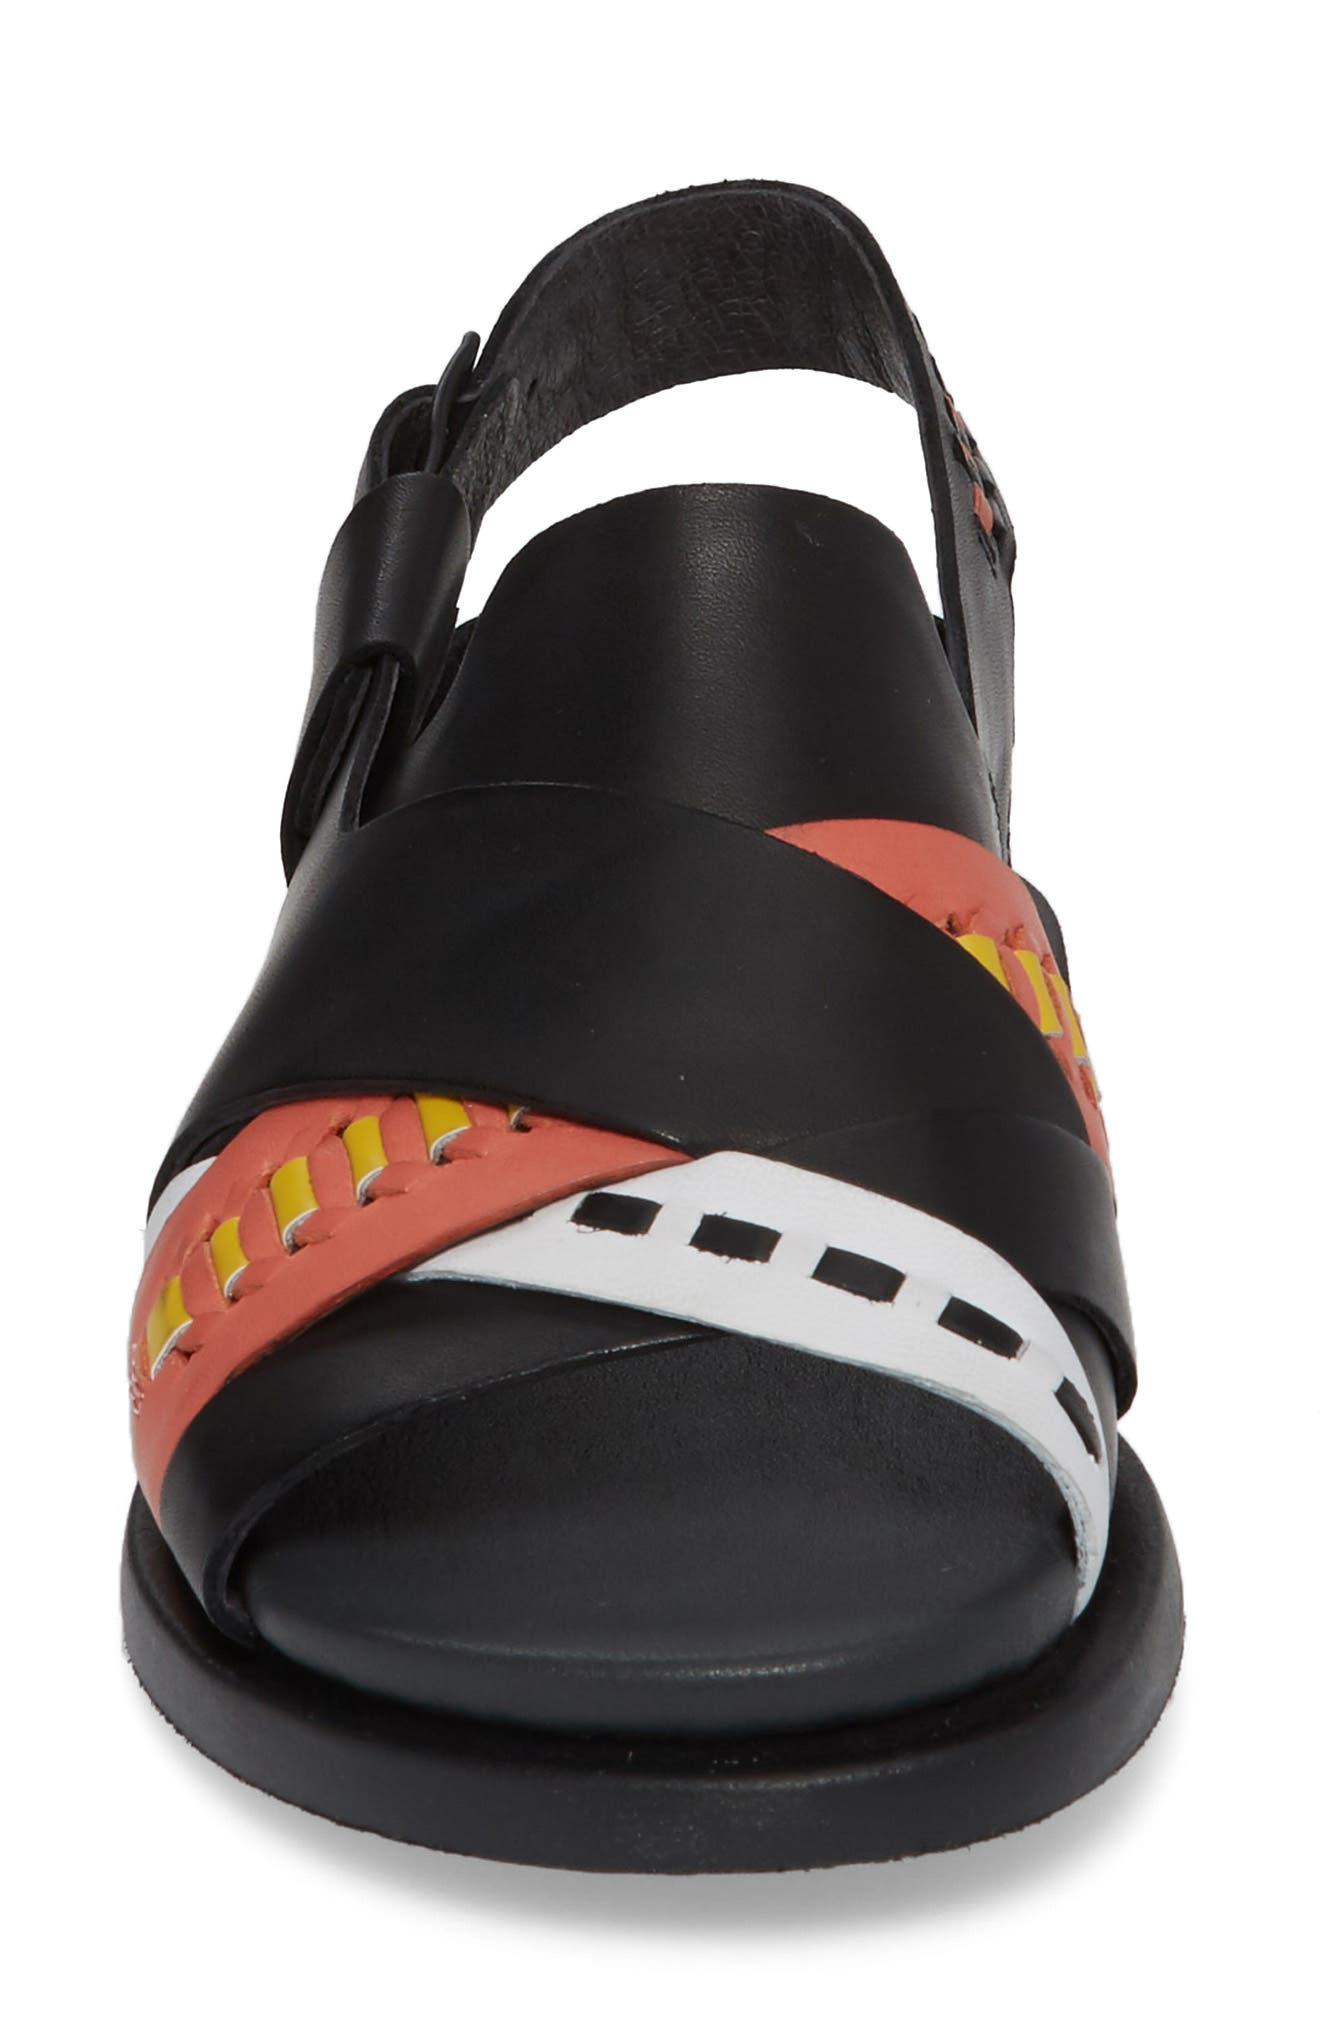 Twins Slingback Sandal,                             Alternate thumbnail 7, color,                             Multi - Assorted Leather